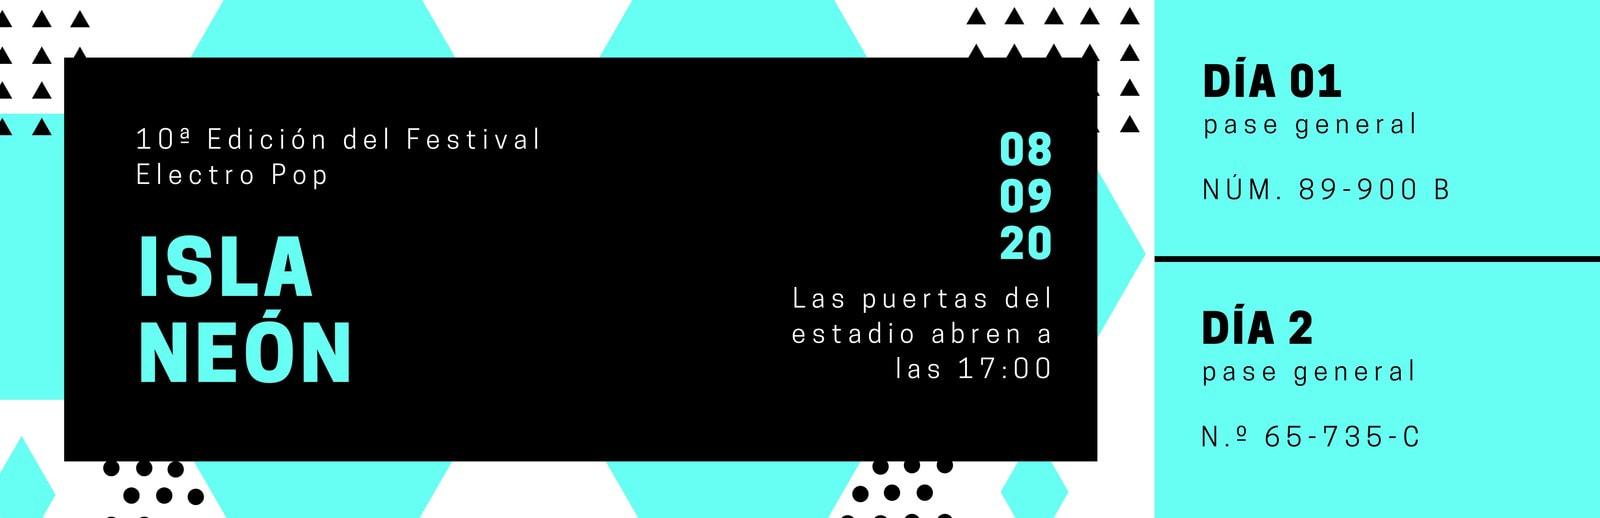 Azul Turquesa Negro Contemporáneo Festival Evento Entrada